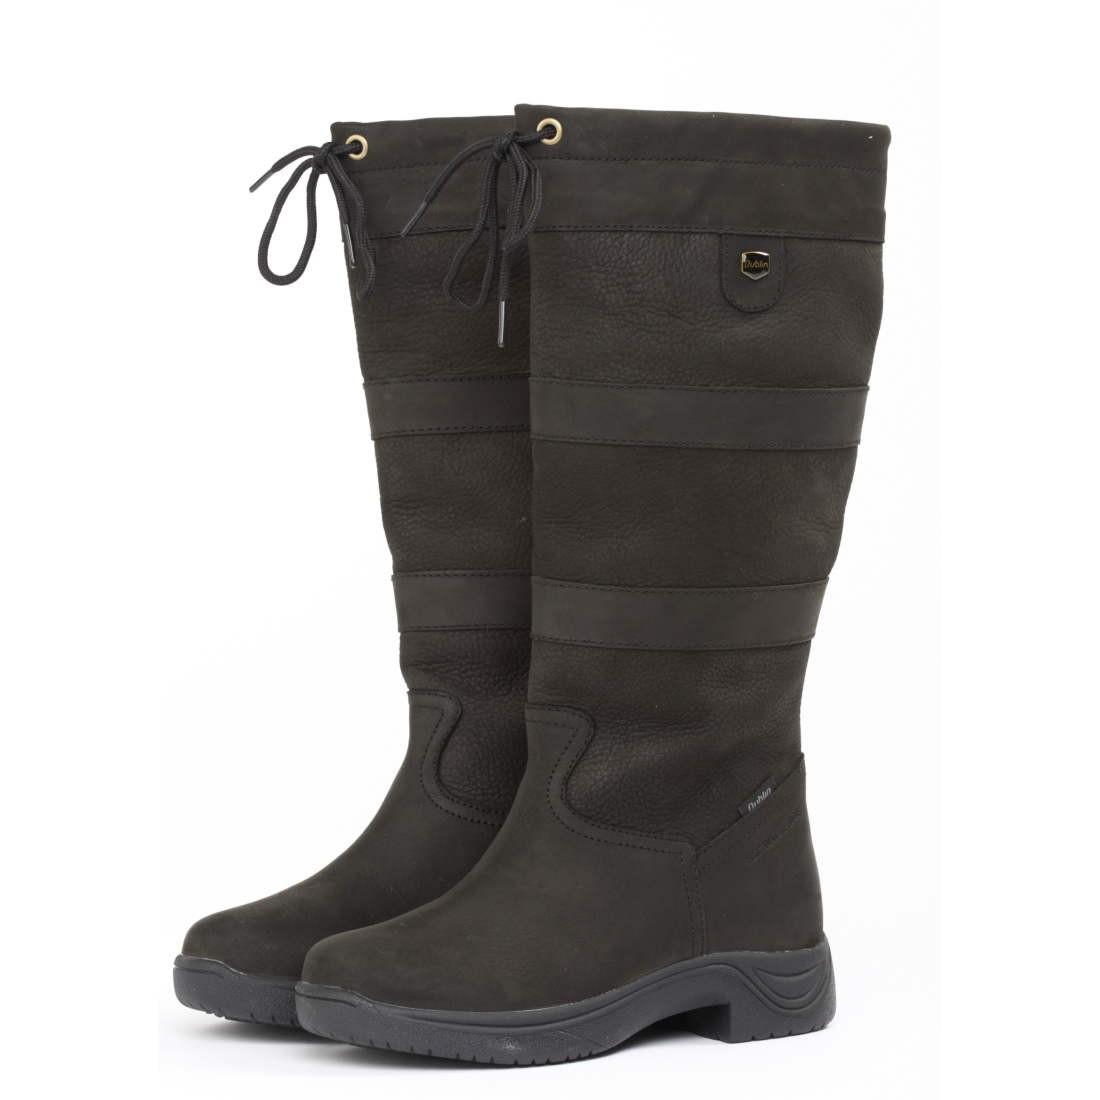 Ariat Boots Waterproof Tall